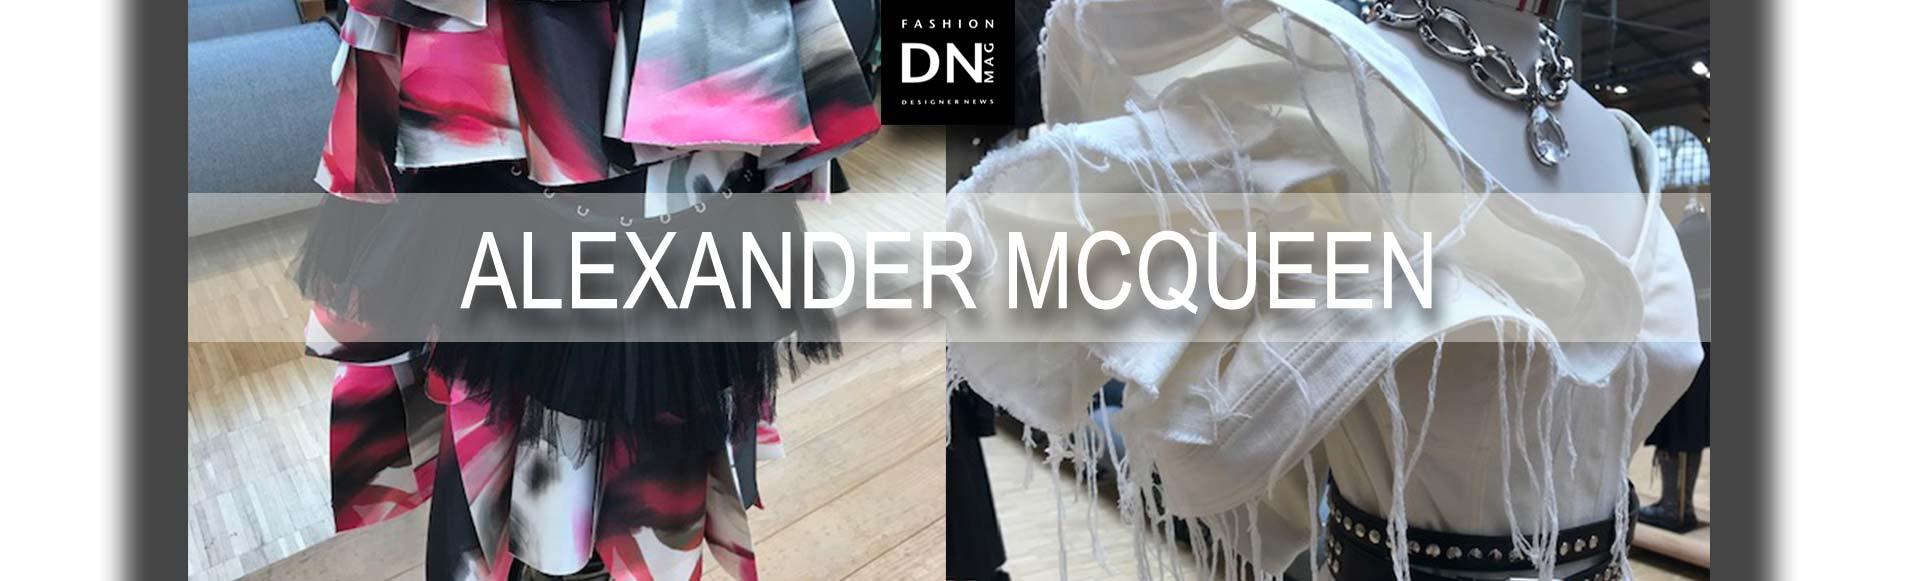 DNMAG-ALEXANDER-MCQUEEN-RTW19-FALL19-20